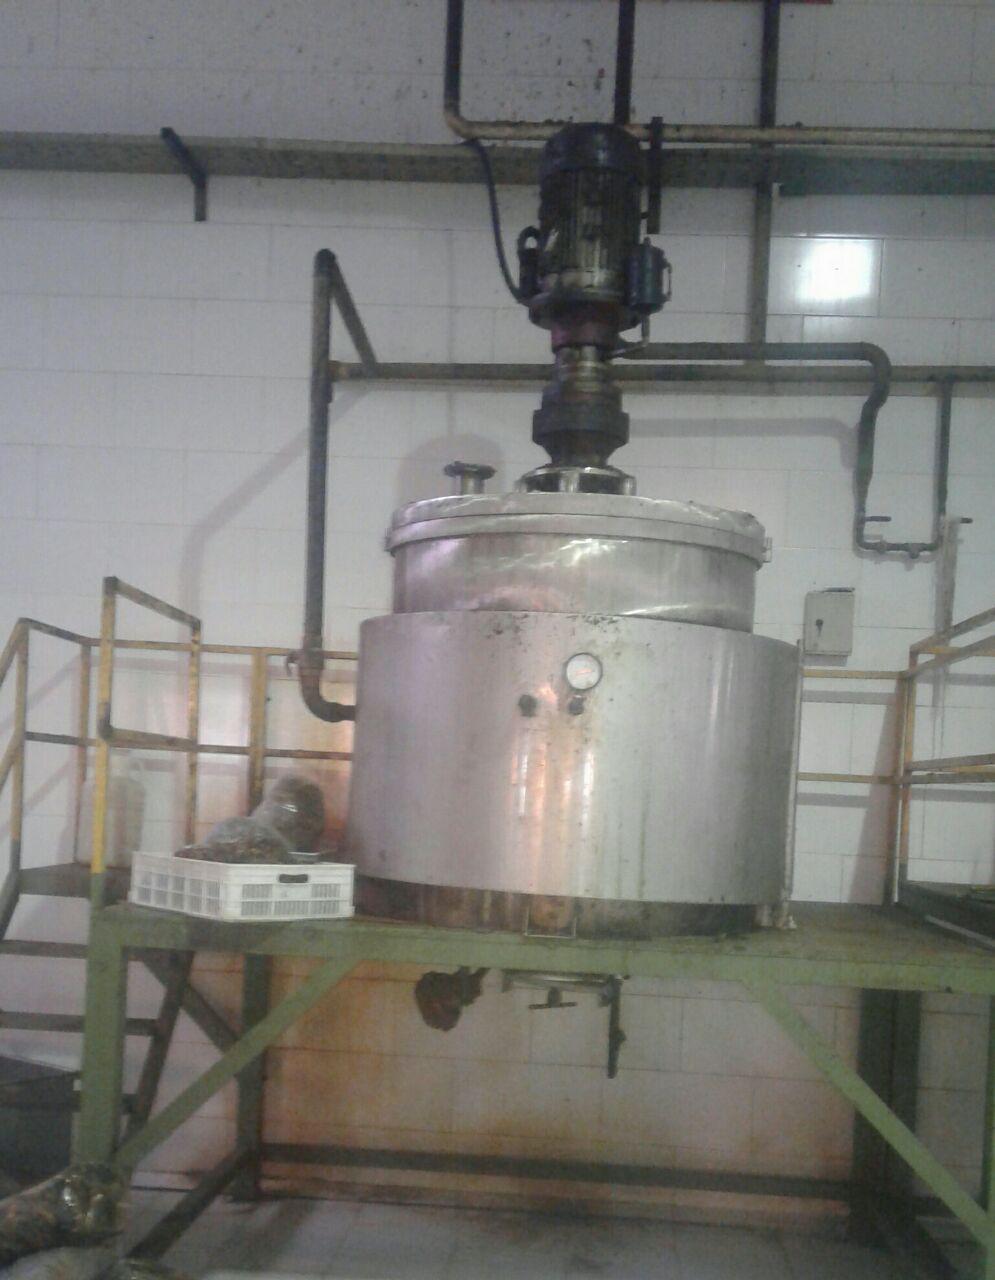 ساخت خط تولید لواشک صنعتی